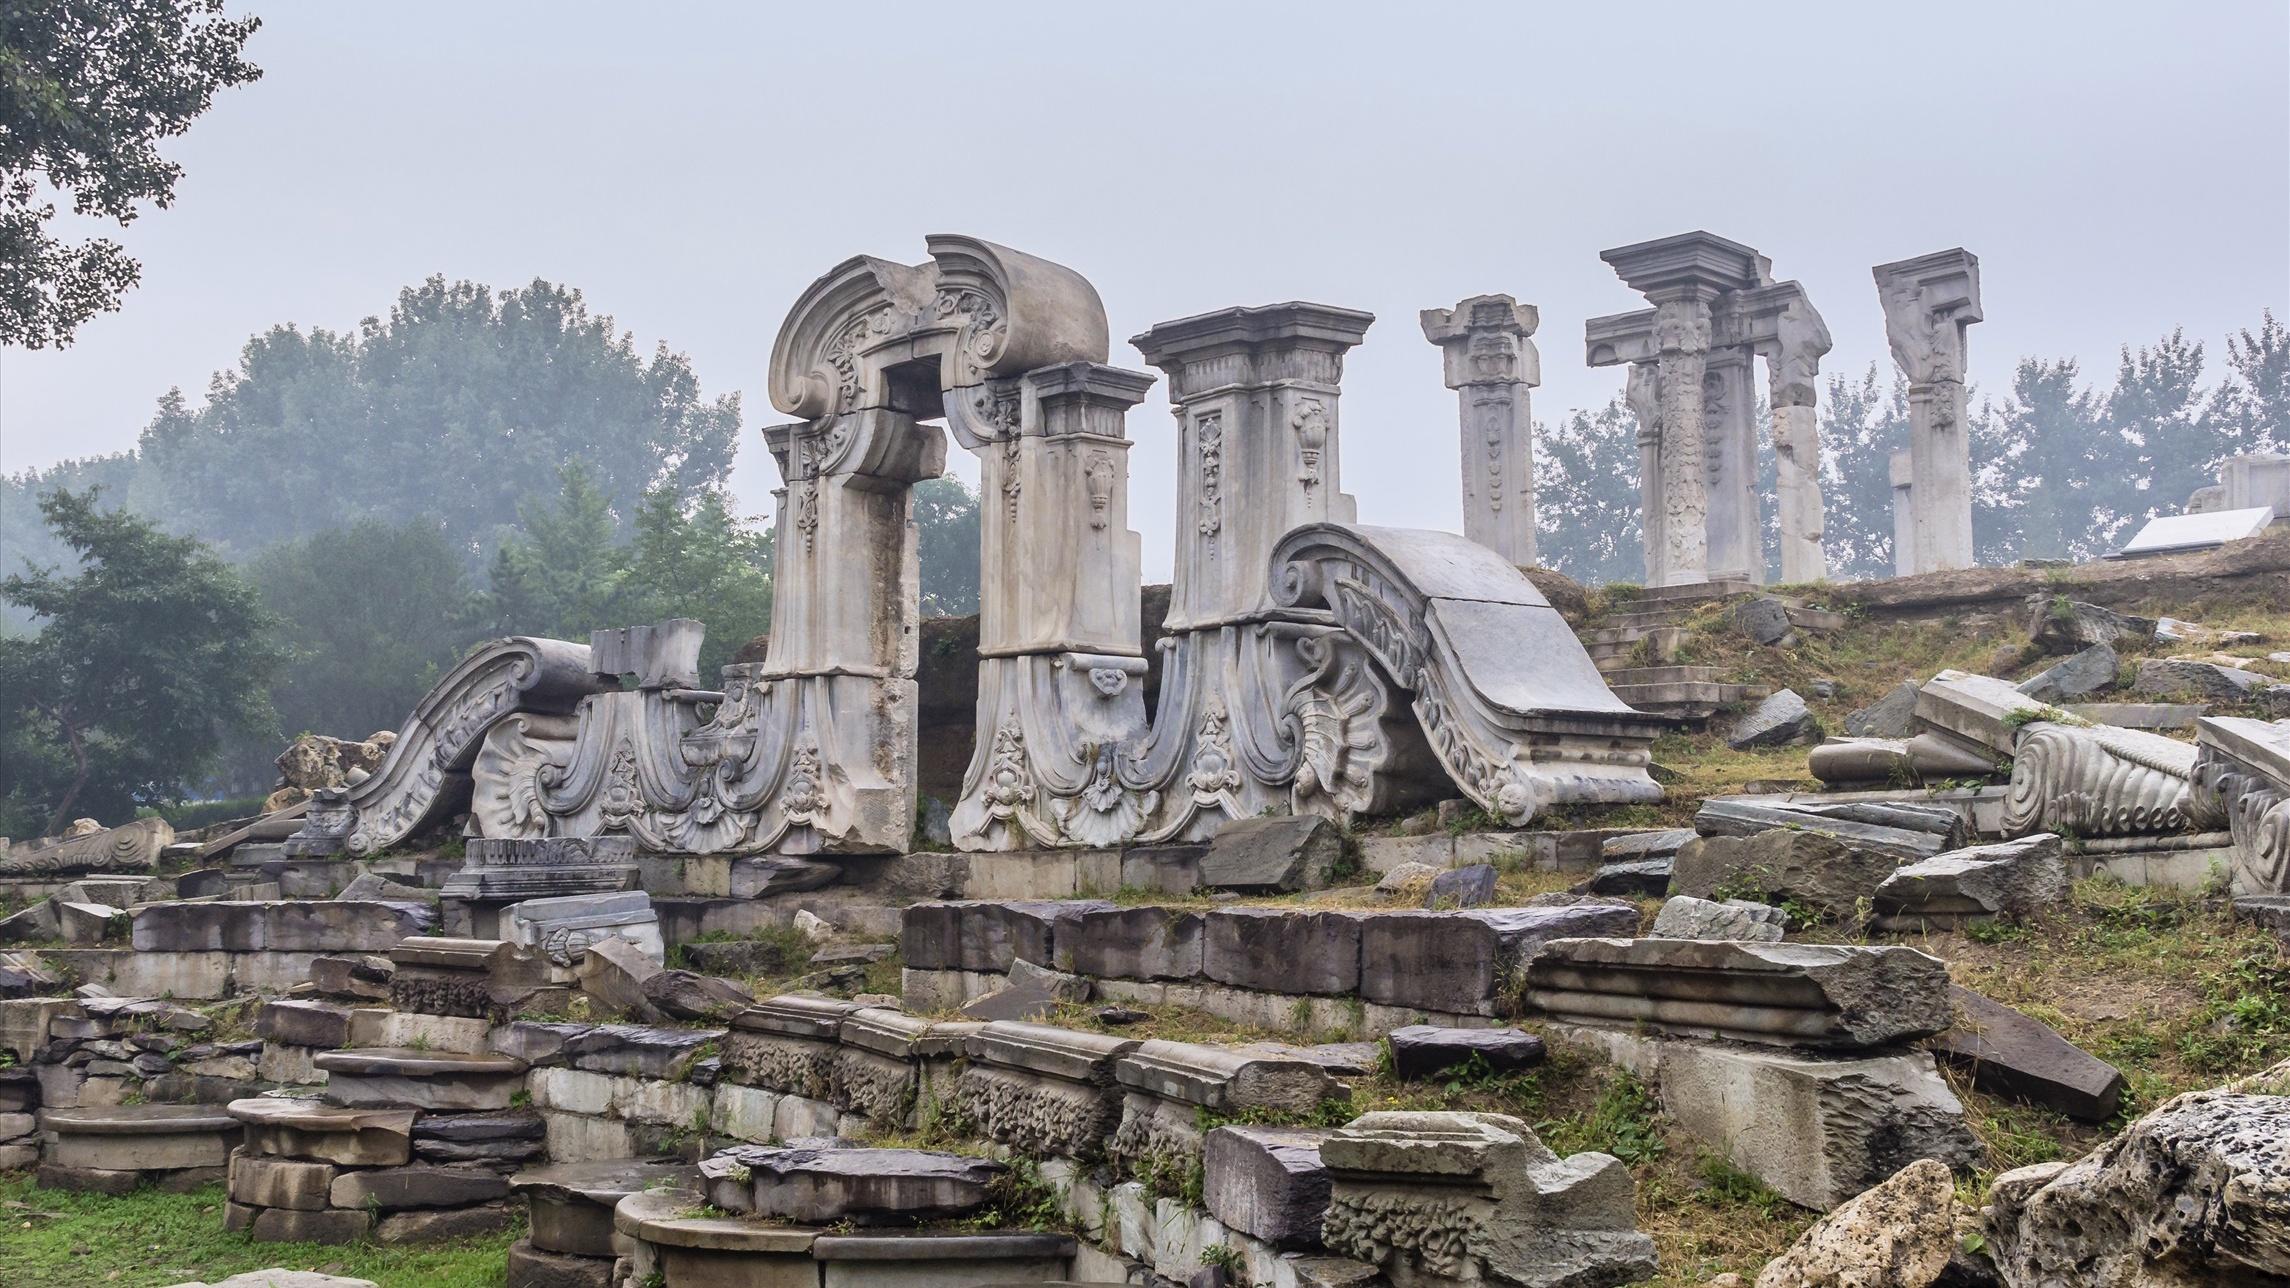 CAFA sets up new research center to study Yuanmingyuan ruins